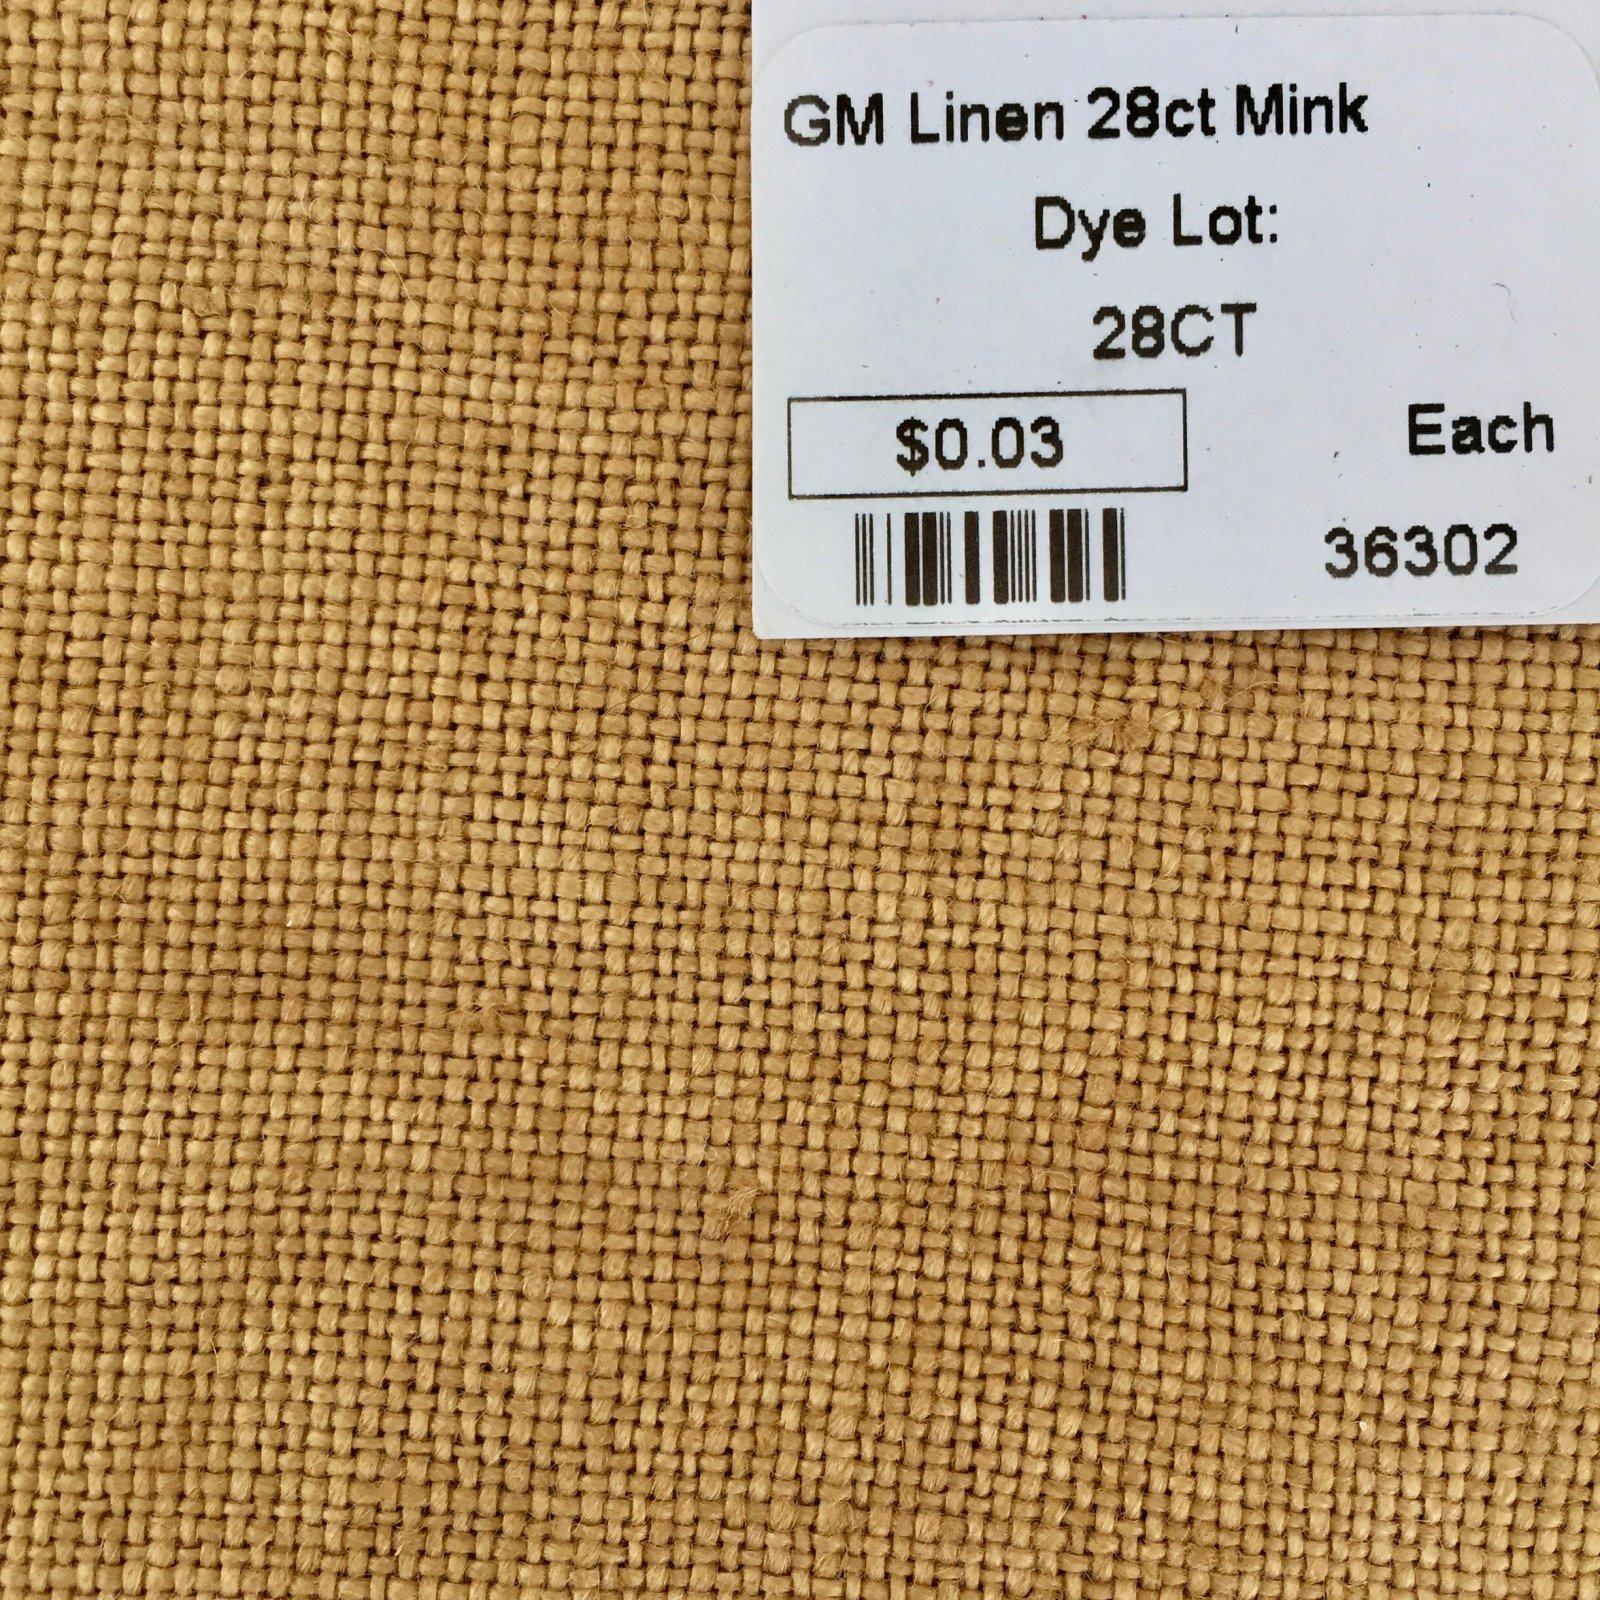 GM Linen 28ct Mink